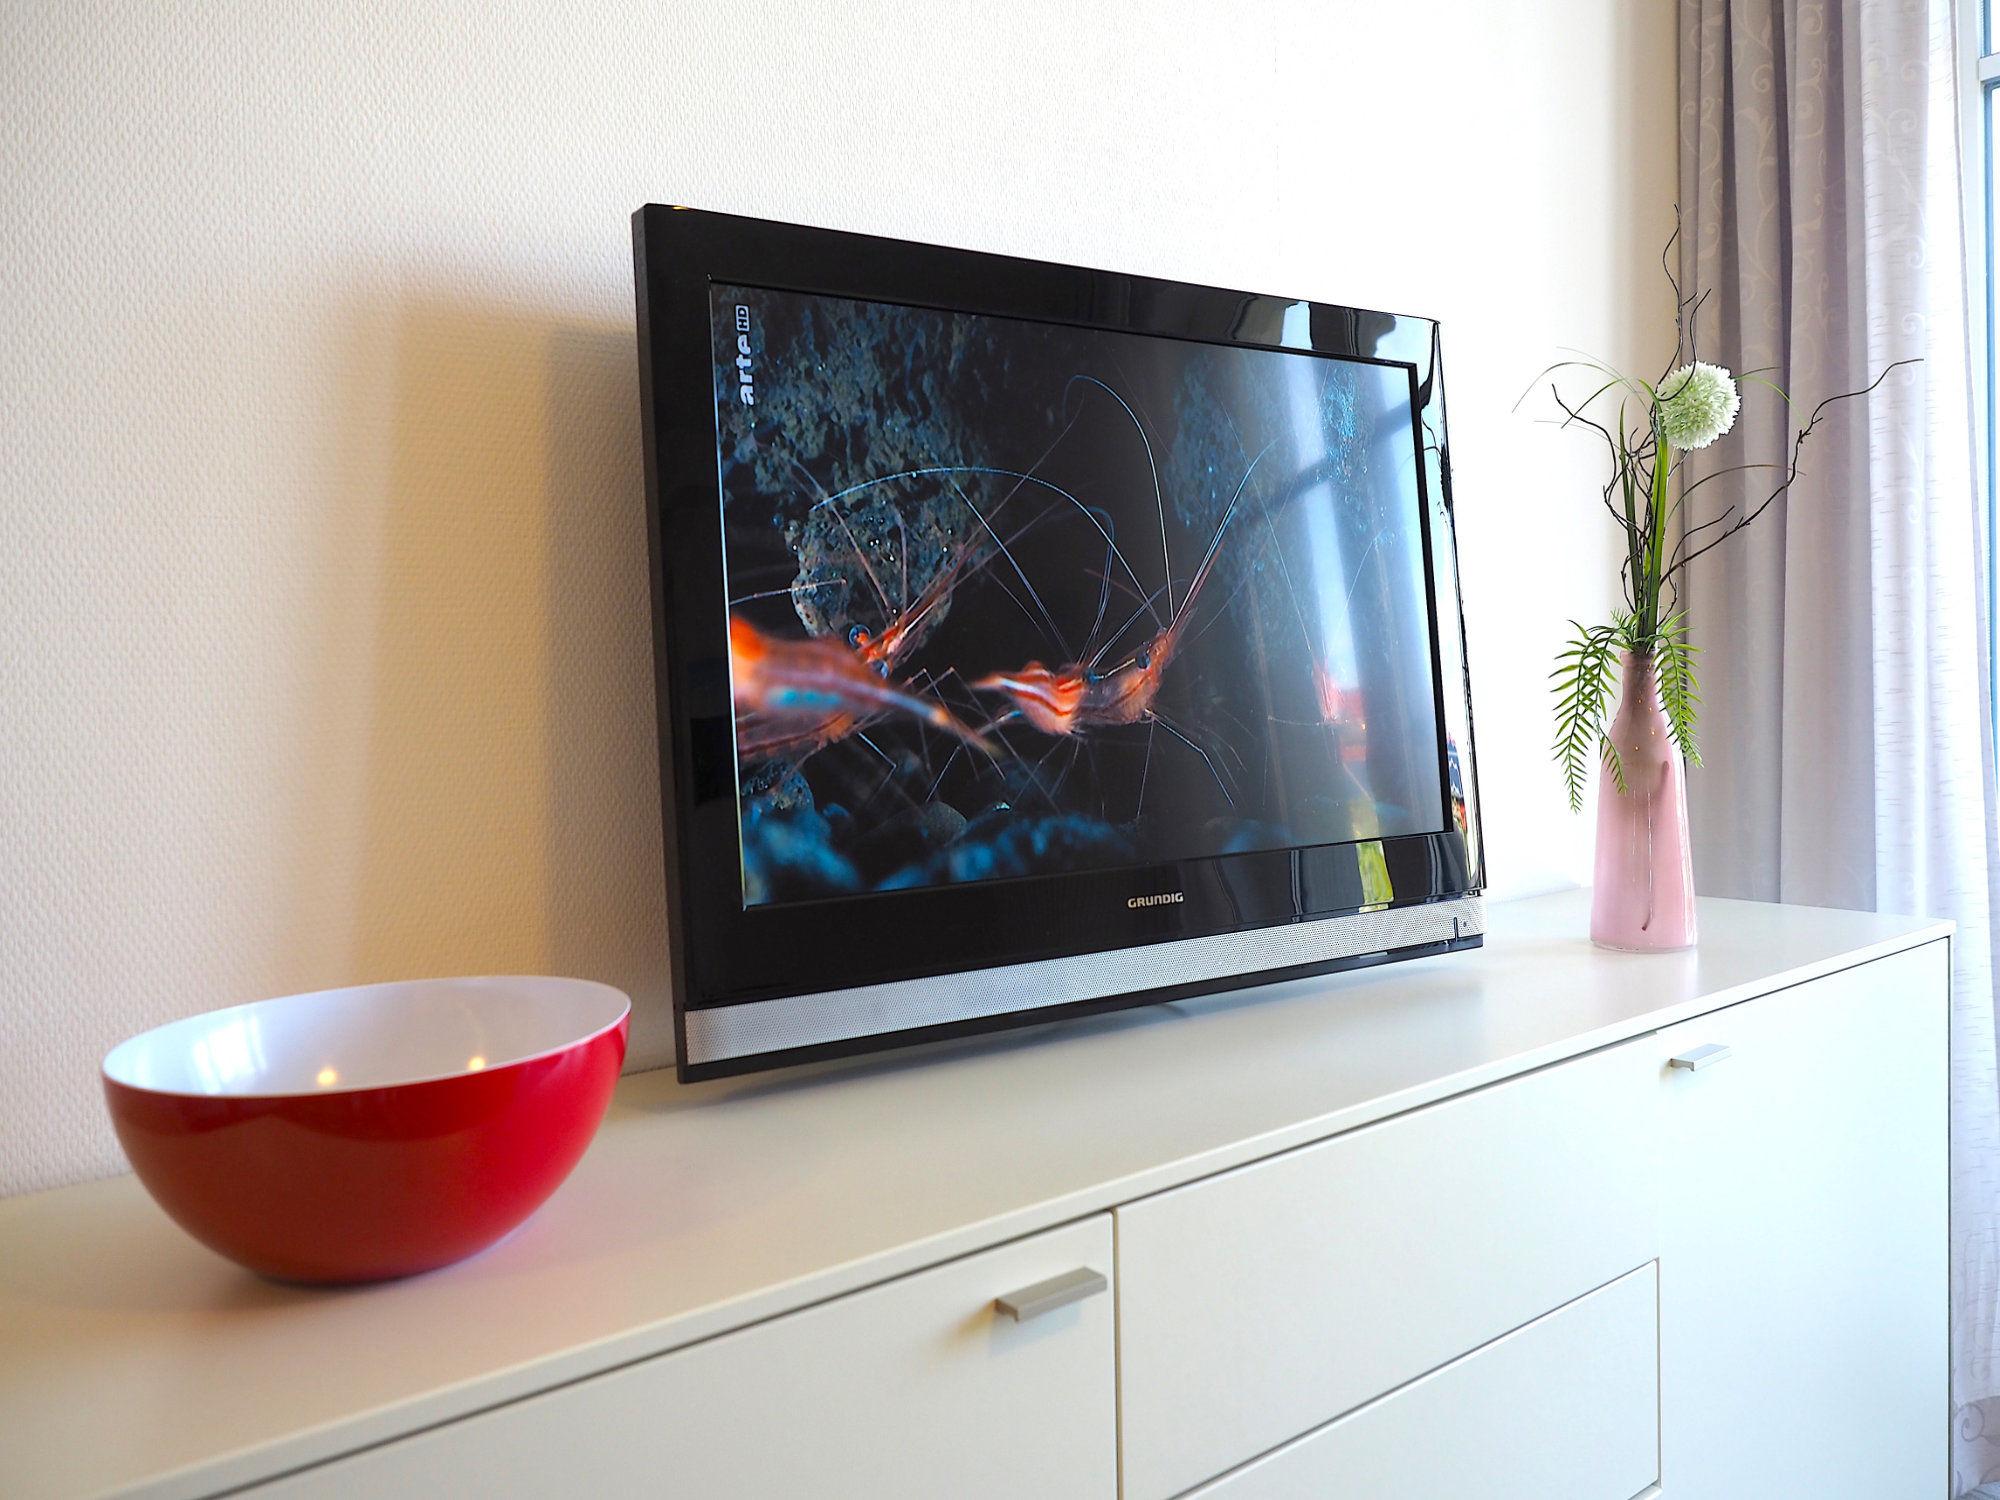 Wohzimmer, Sideboard mit Flatscreen TV